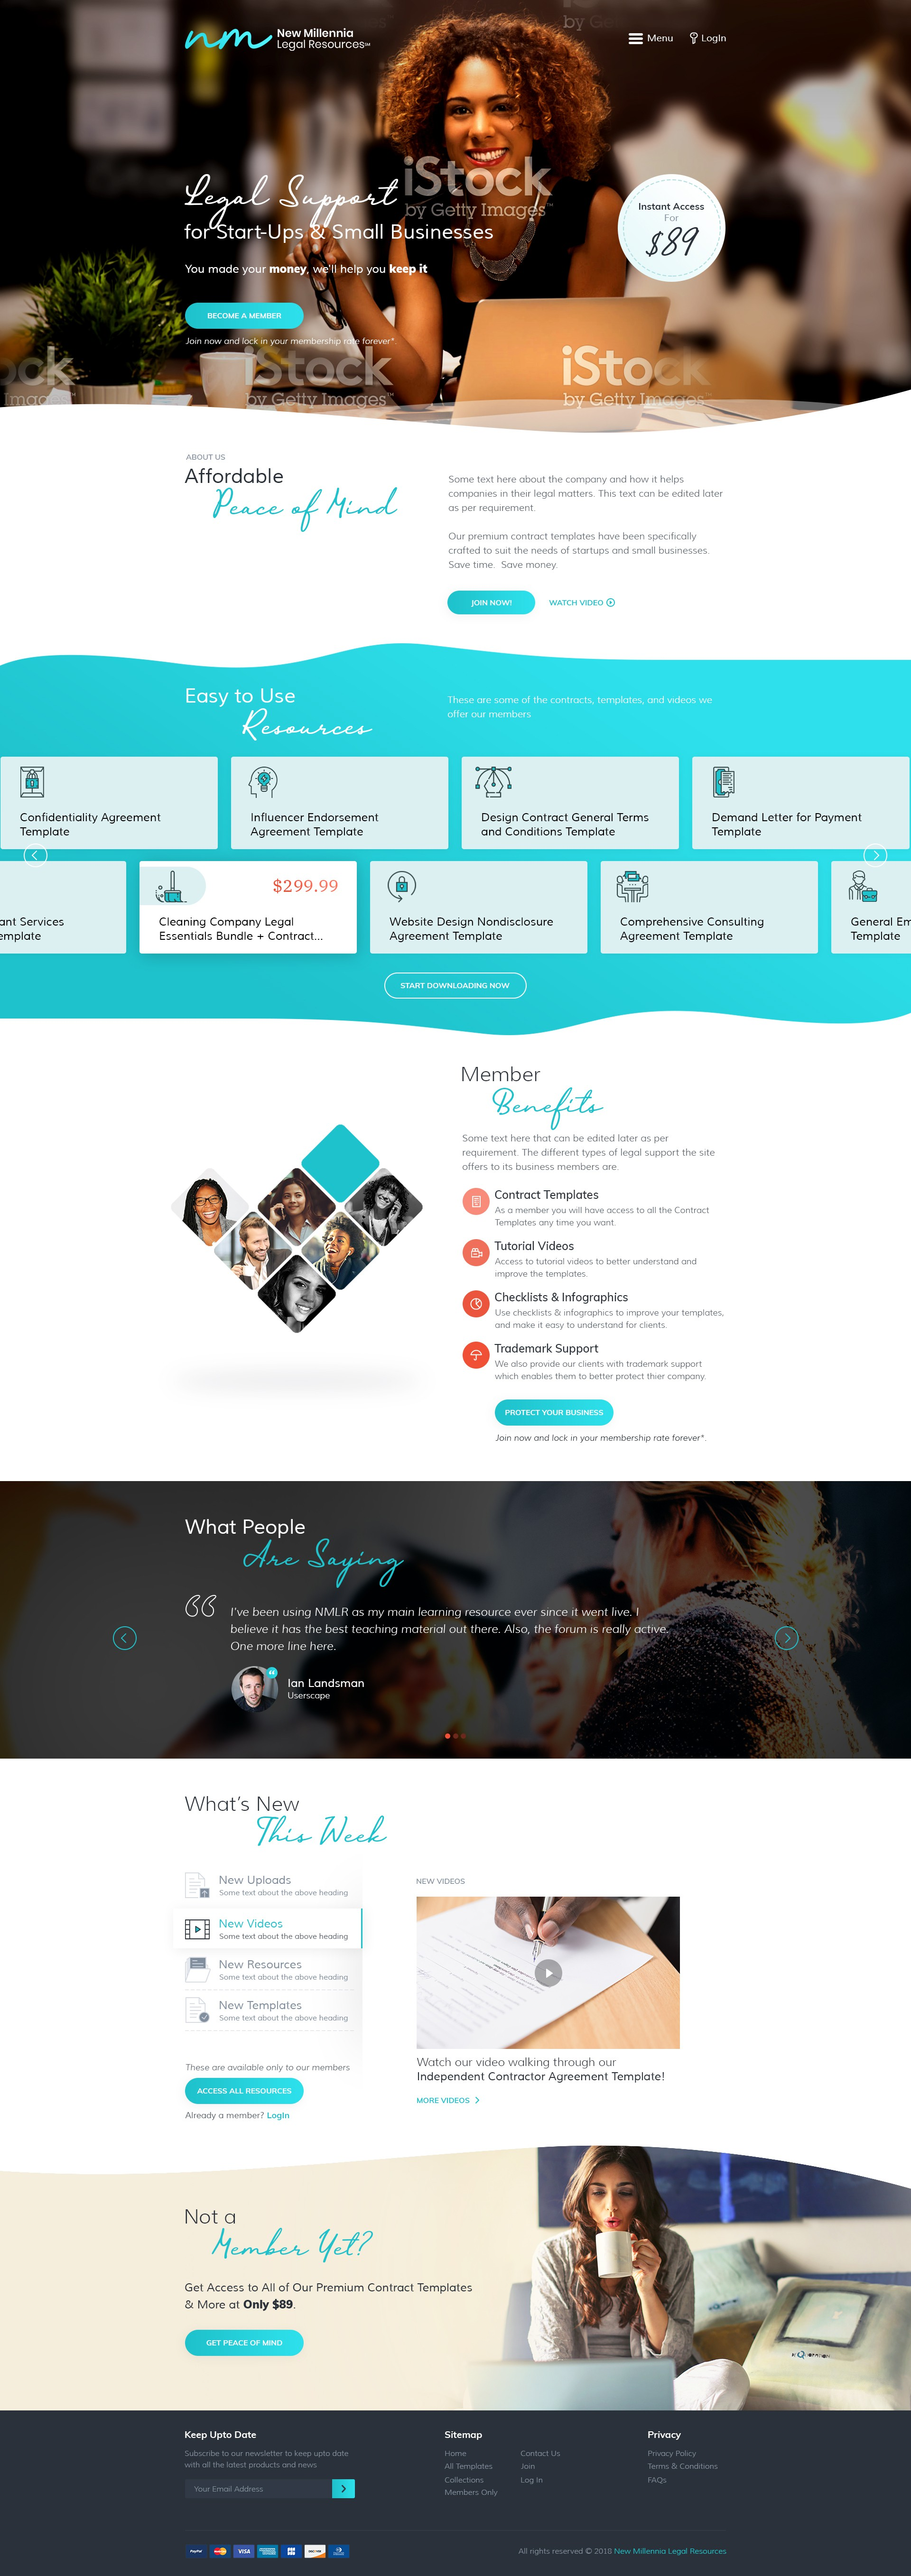 Design an elegant, sophisticated, & modern legal membership webpage